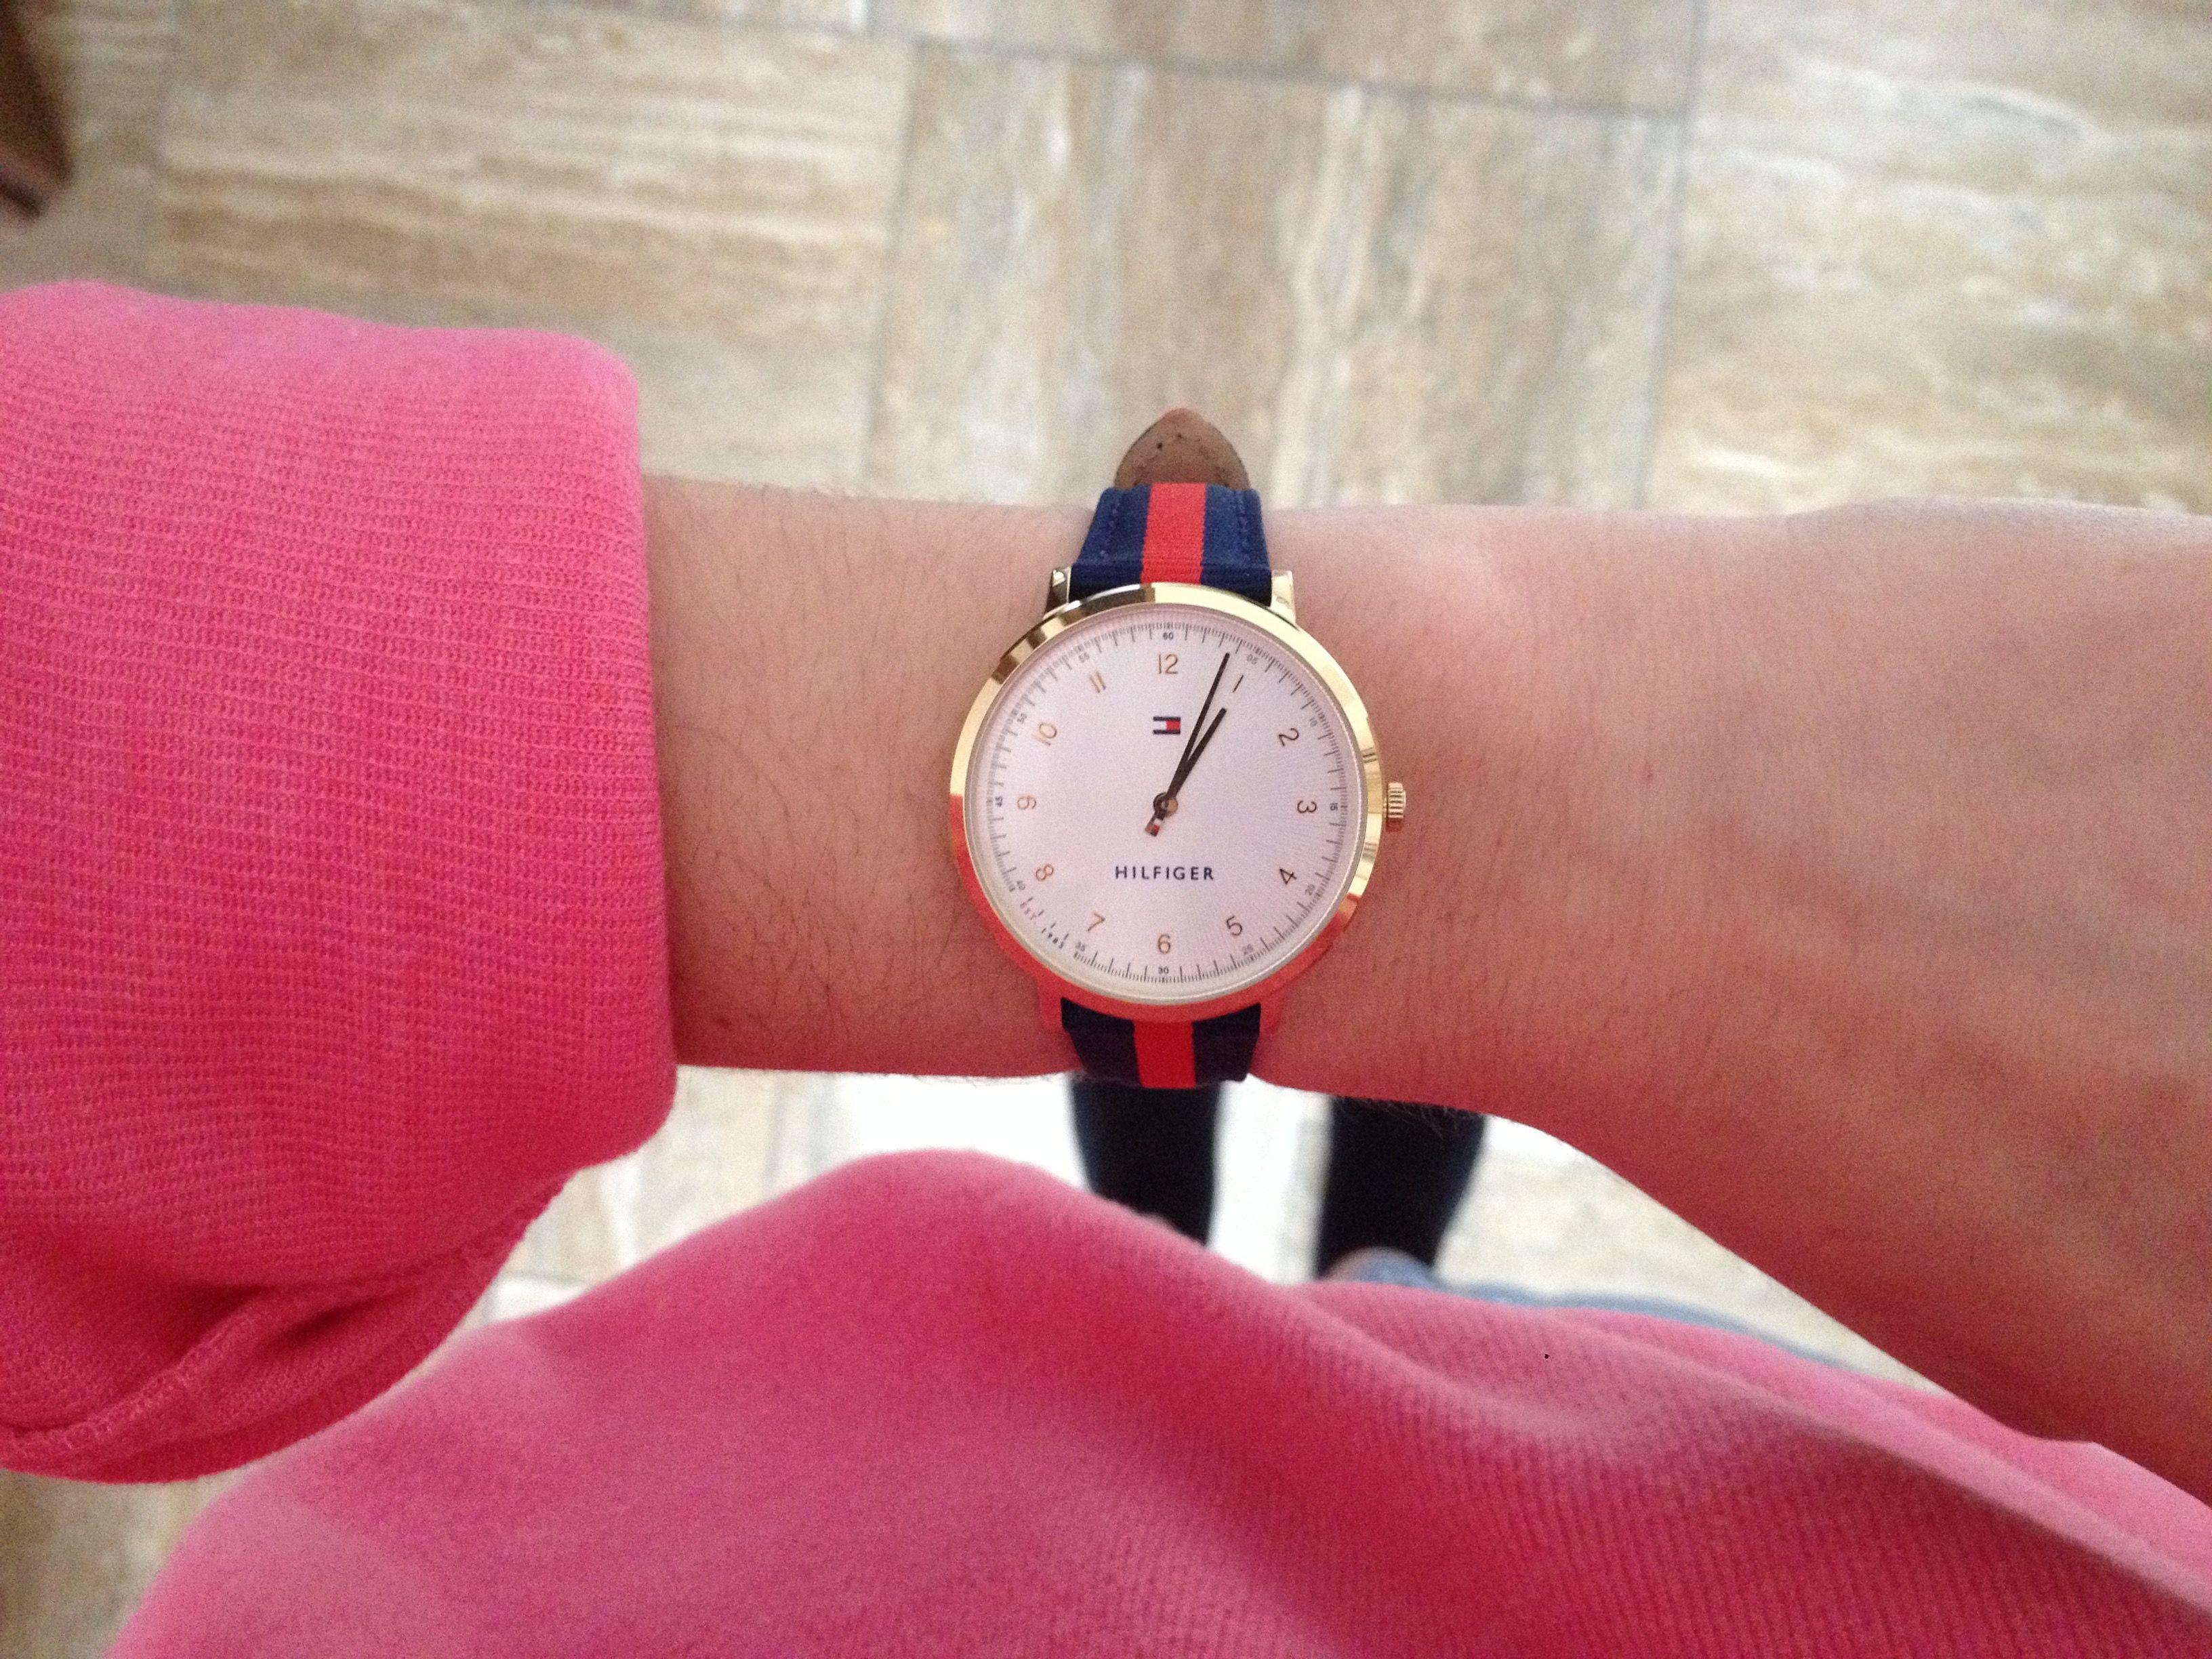 Tommy Hilfiger Watch #tommyhilfiger #watch